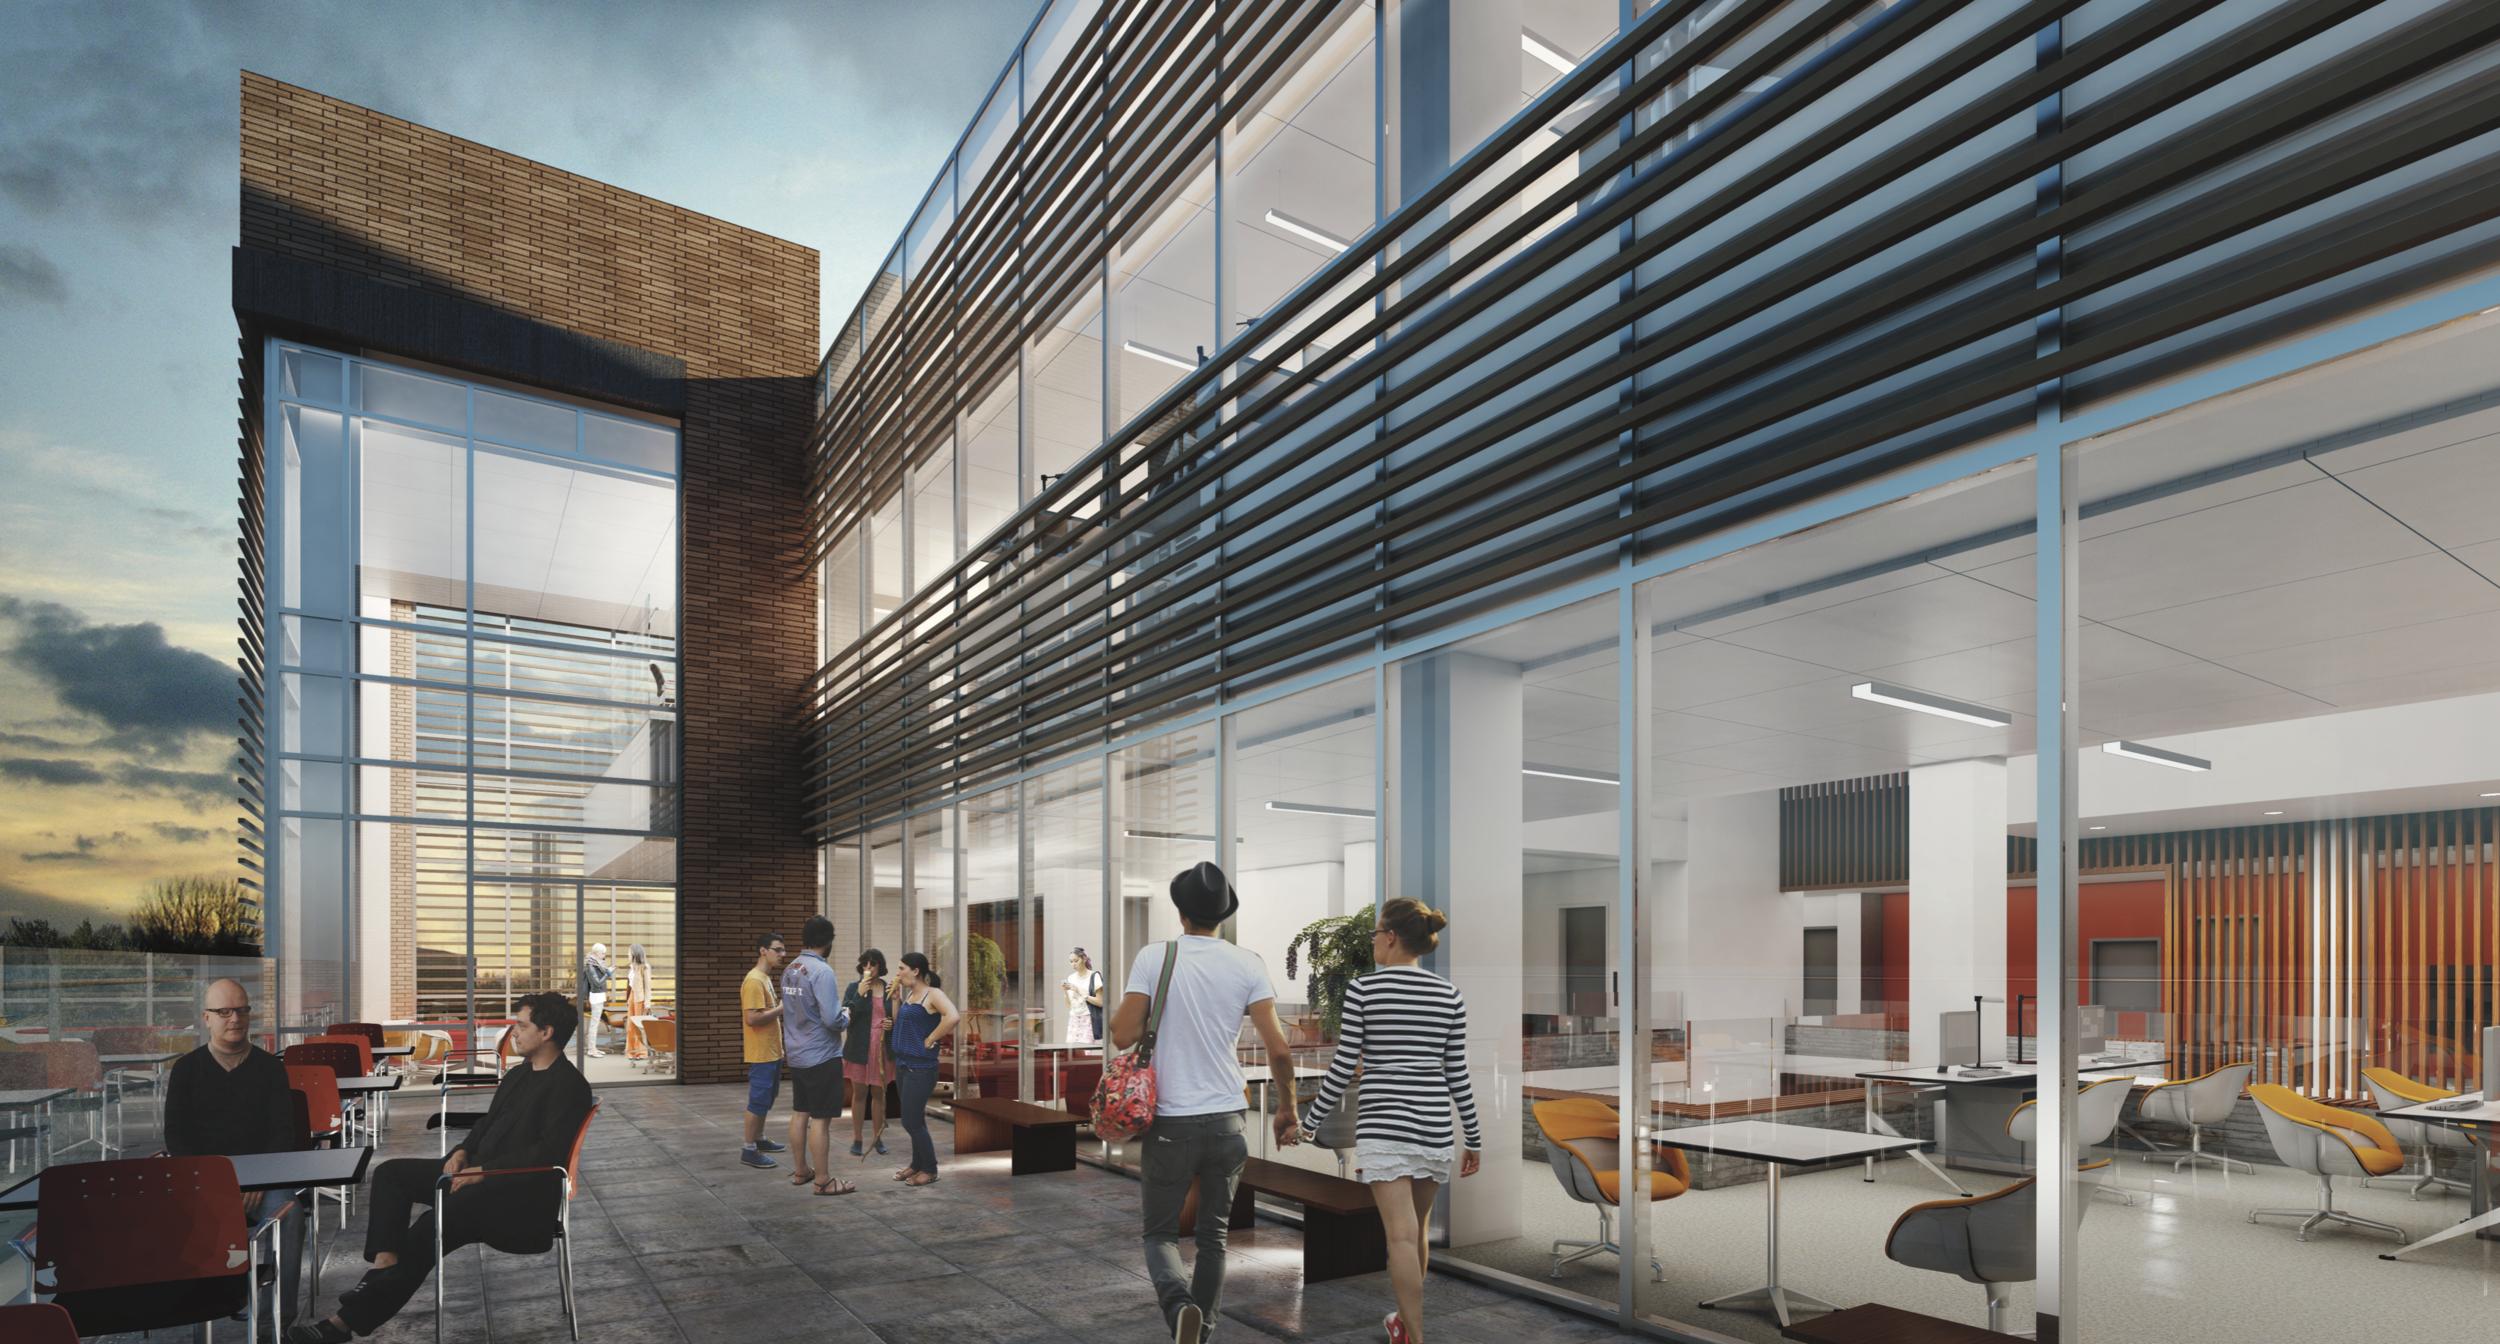 UCR Multidisciplinary Building I - LEED PLATINUM (Projected)